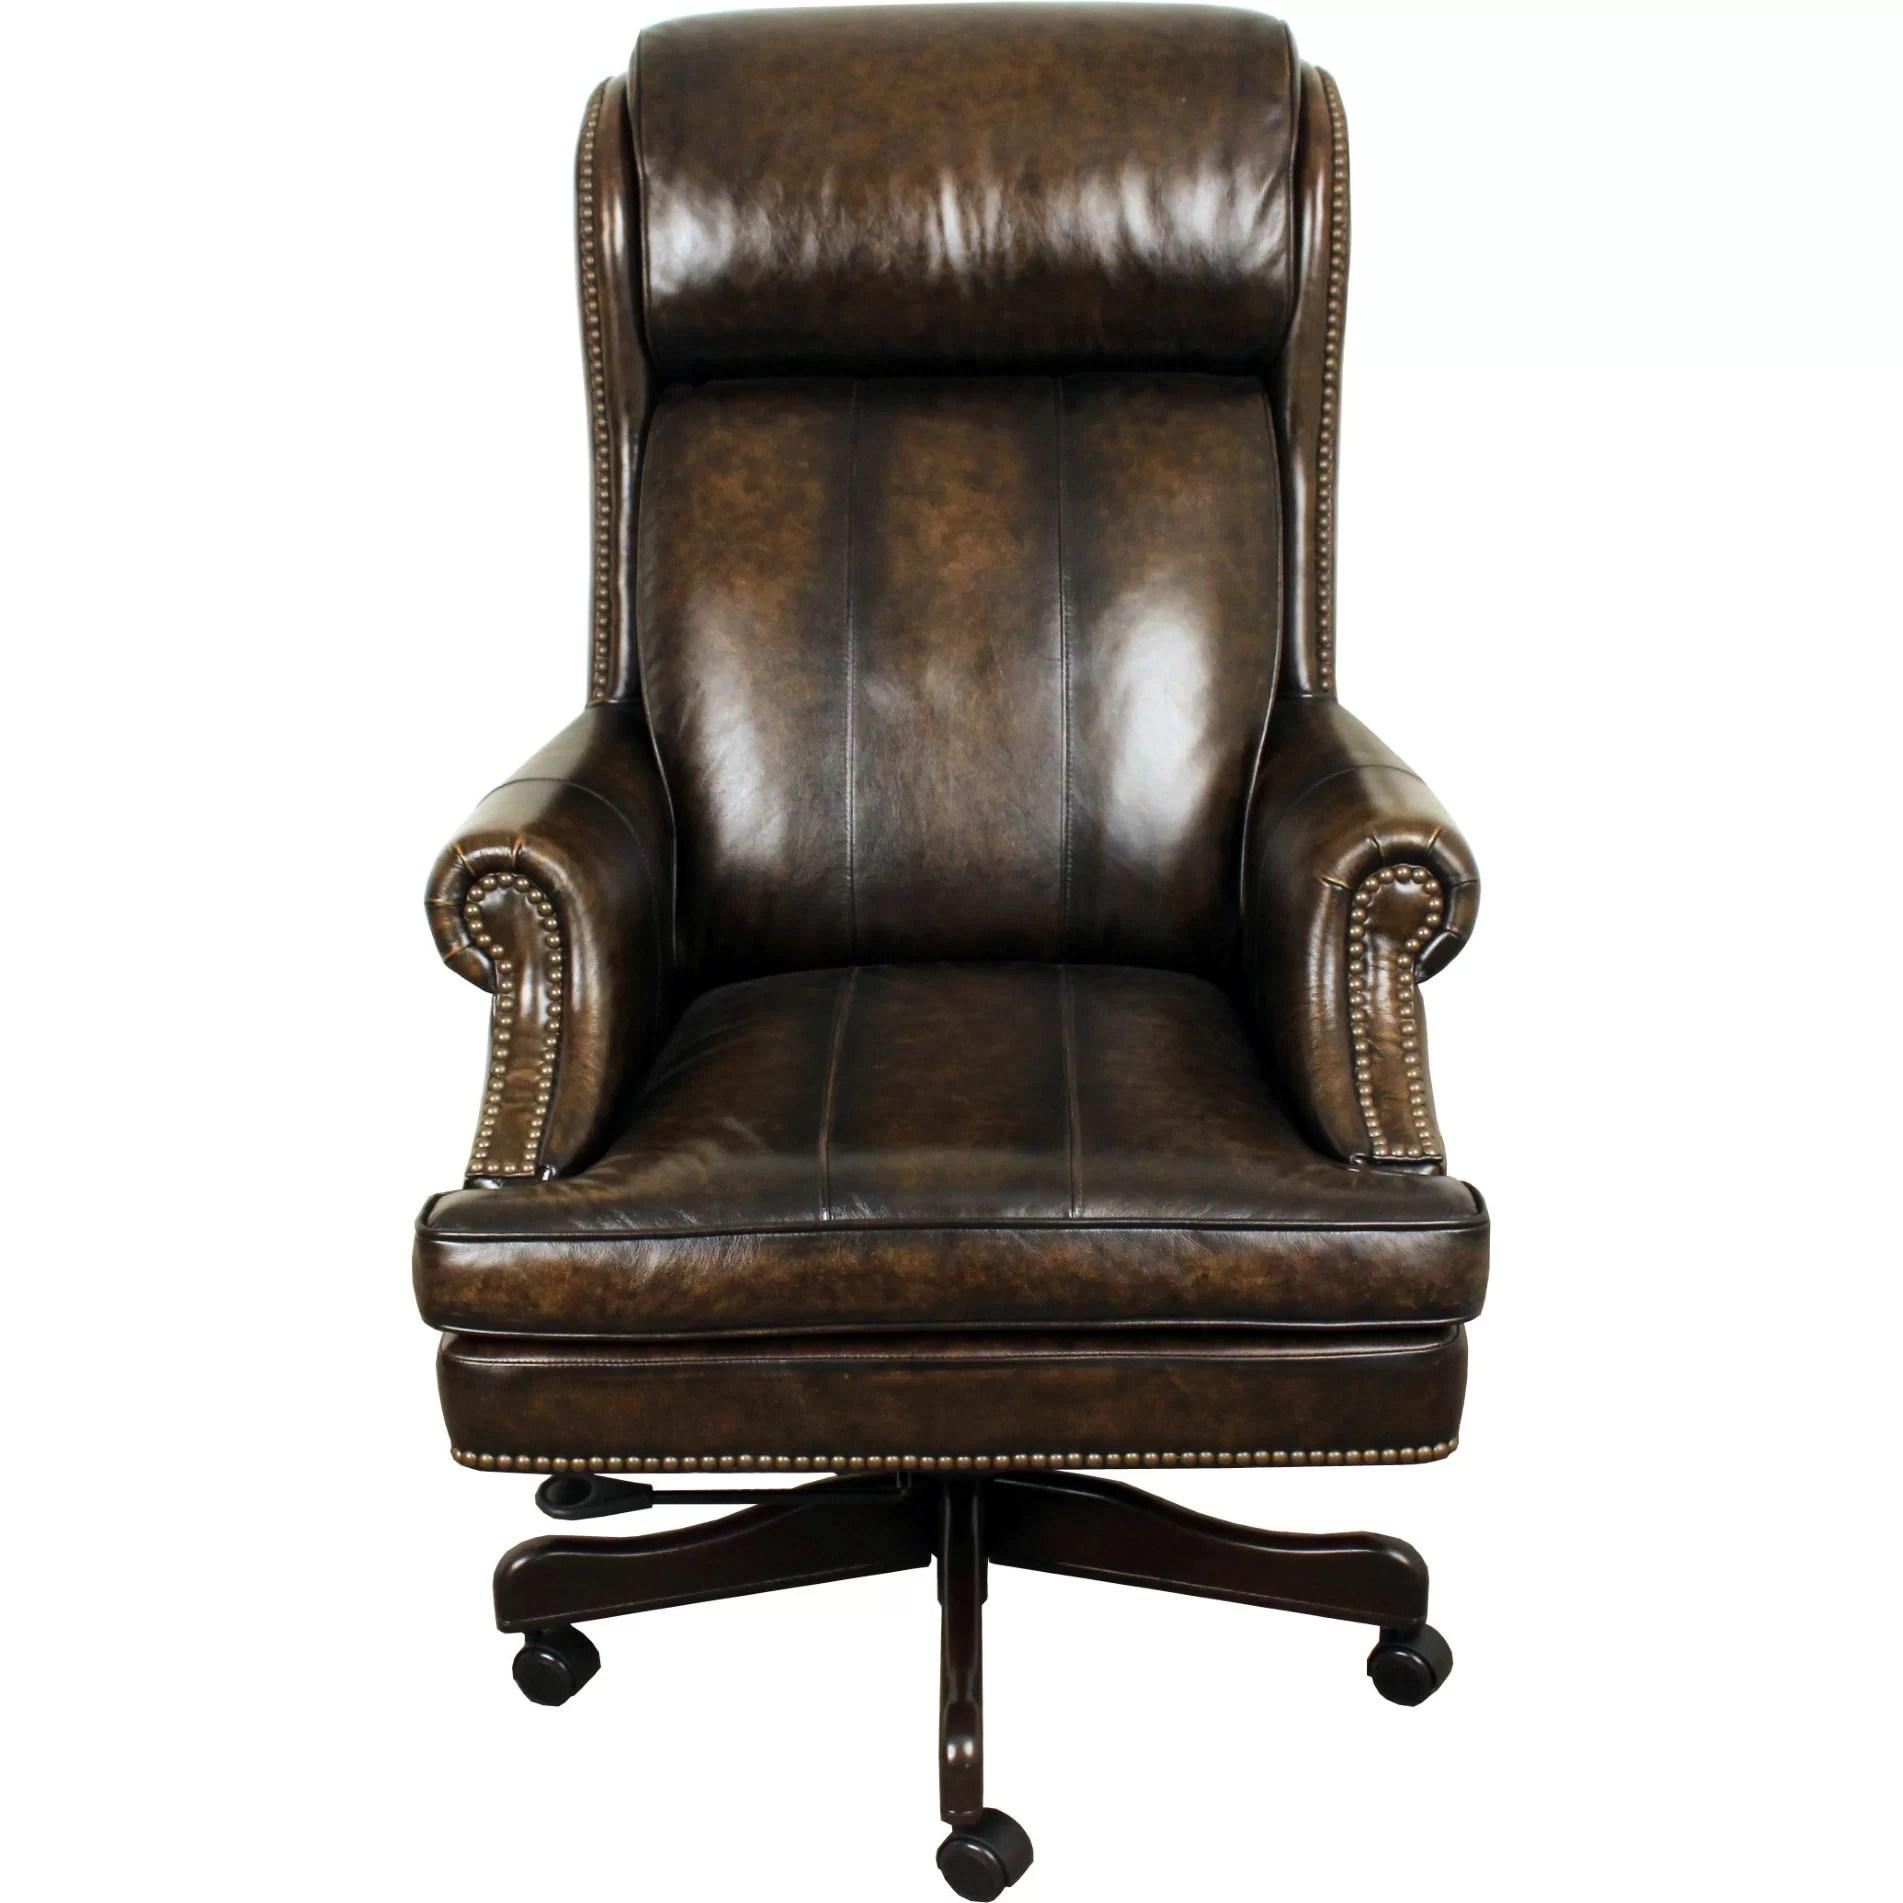 high back leather executive chair covers derbyshire lynton office wayfair